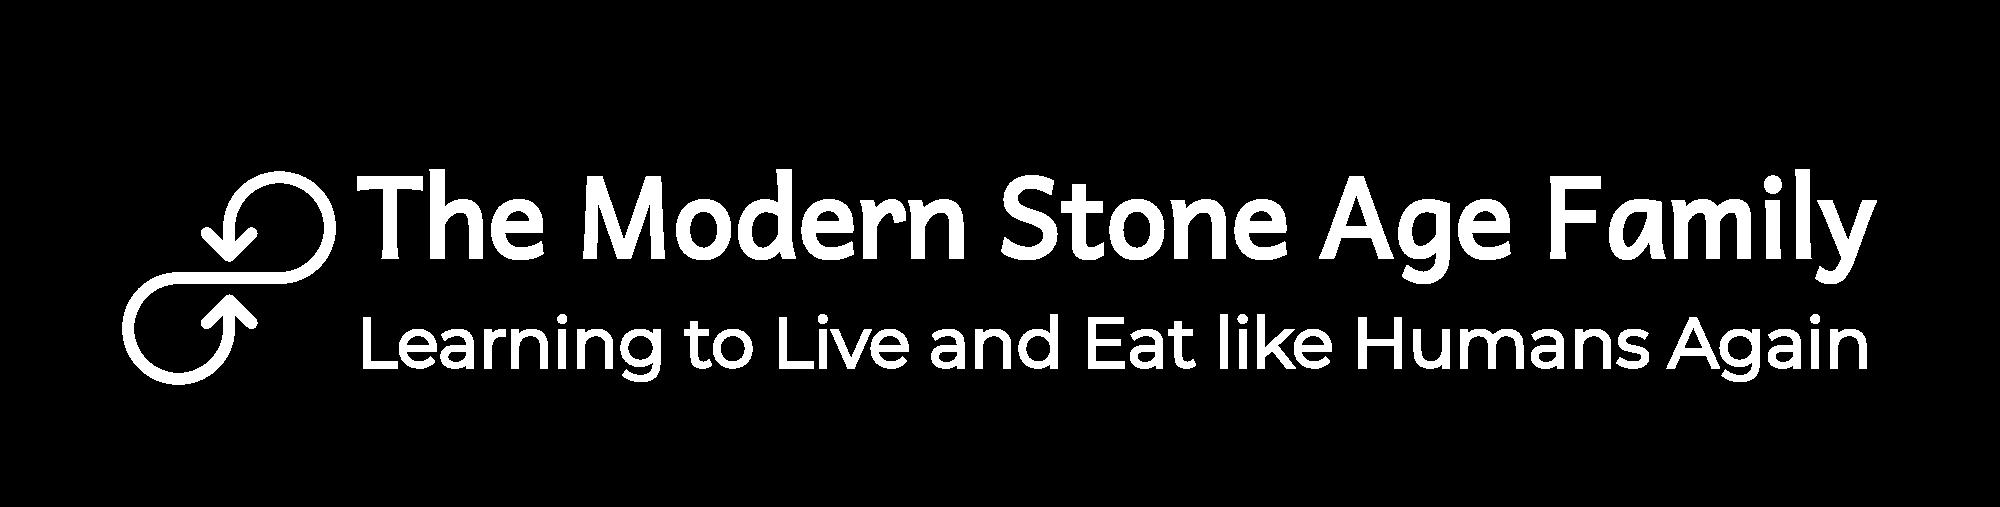 The Modern Stone Age Family-logo-white (1).png